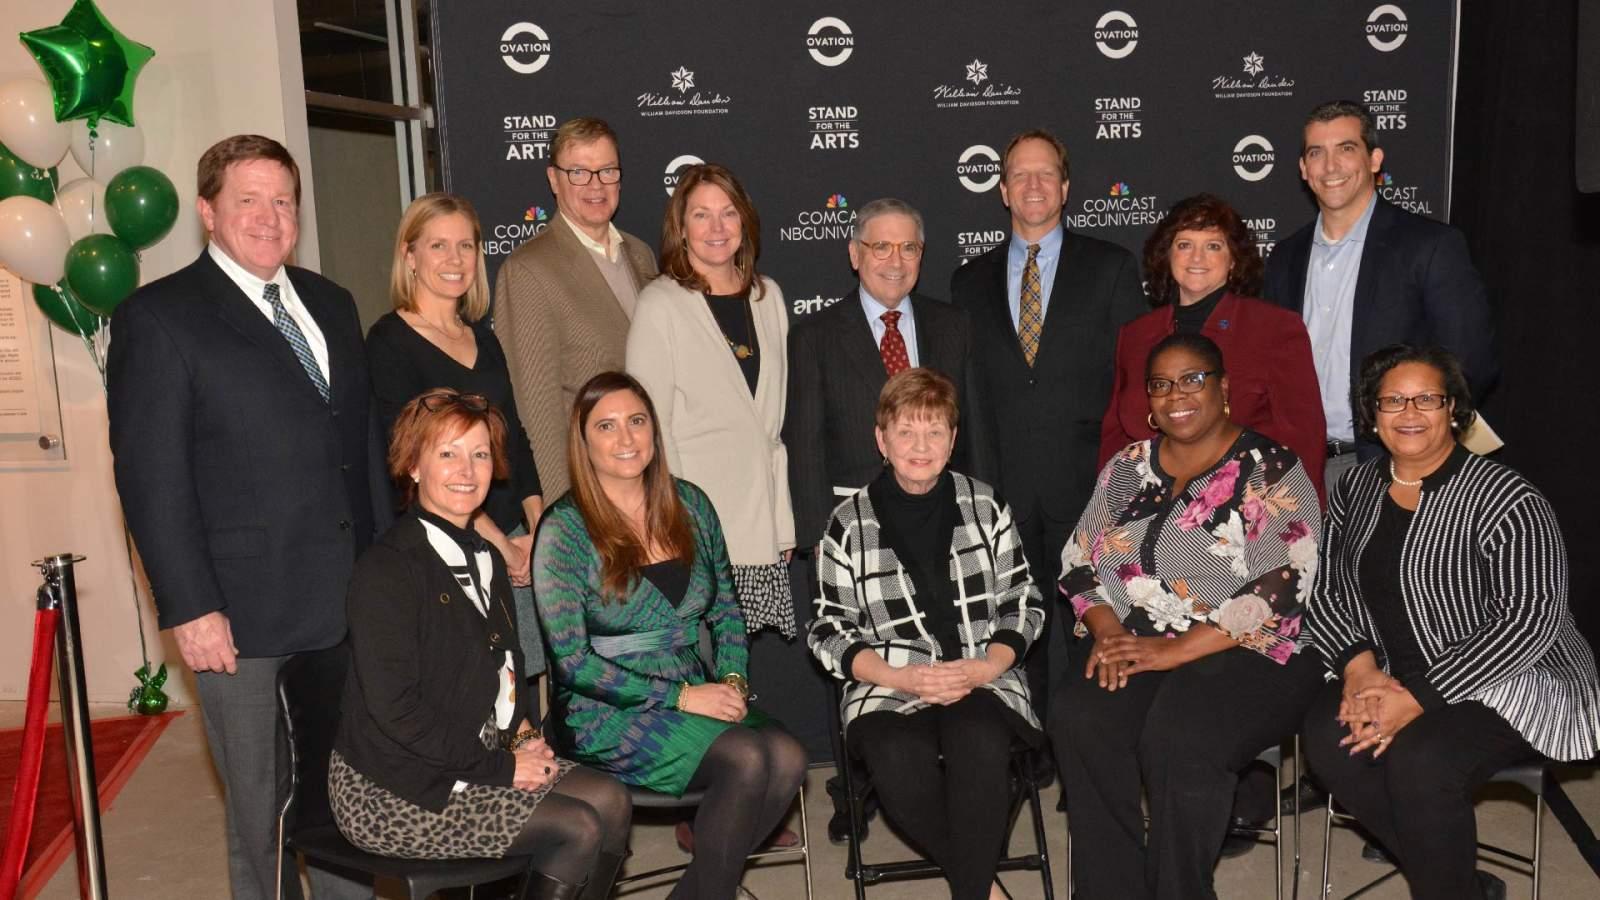 City Hall Artspace Lofts Celebrates Development of Connector